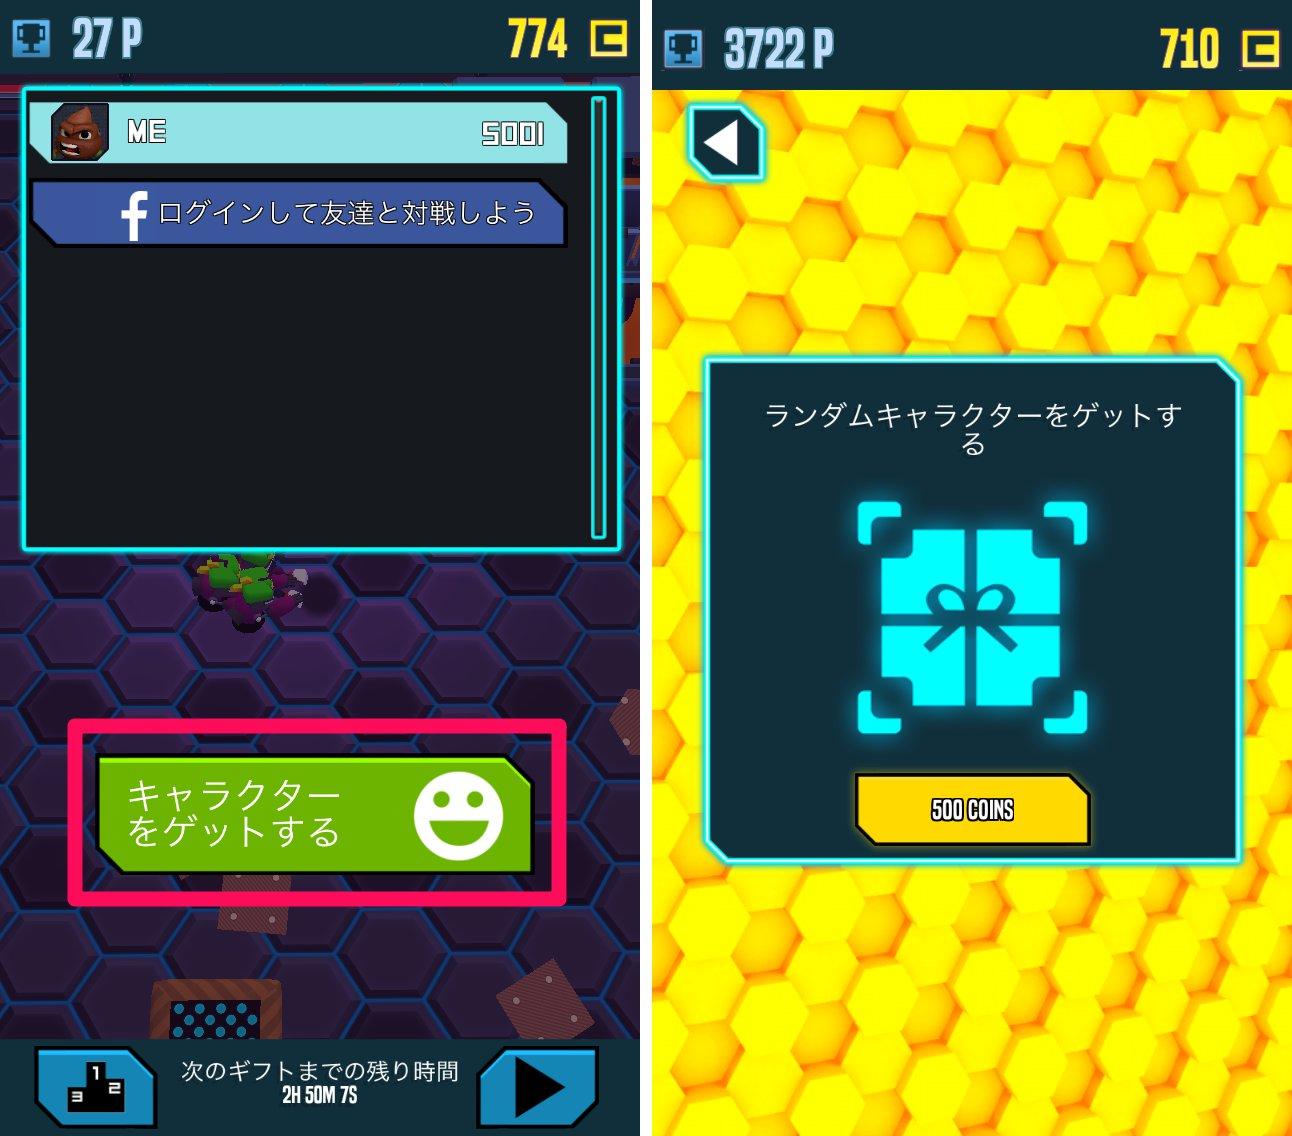 Frantic Shooter【ゲームレビュー】